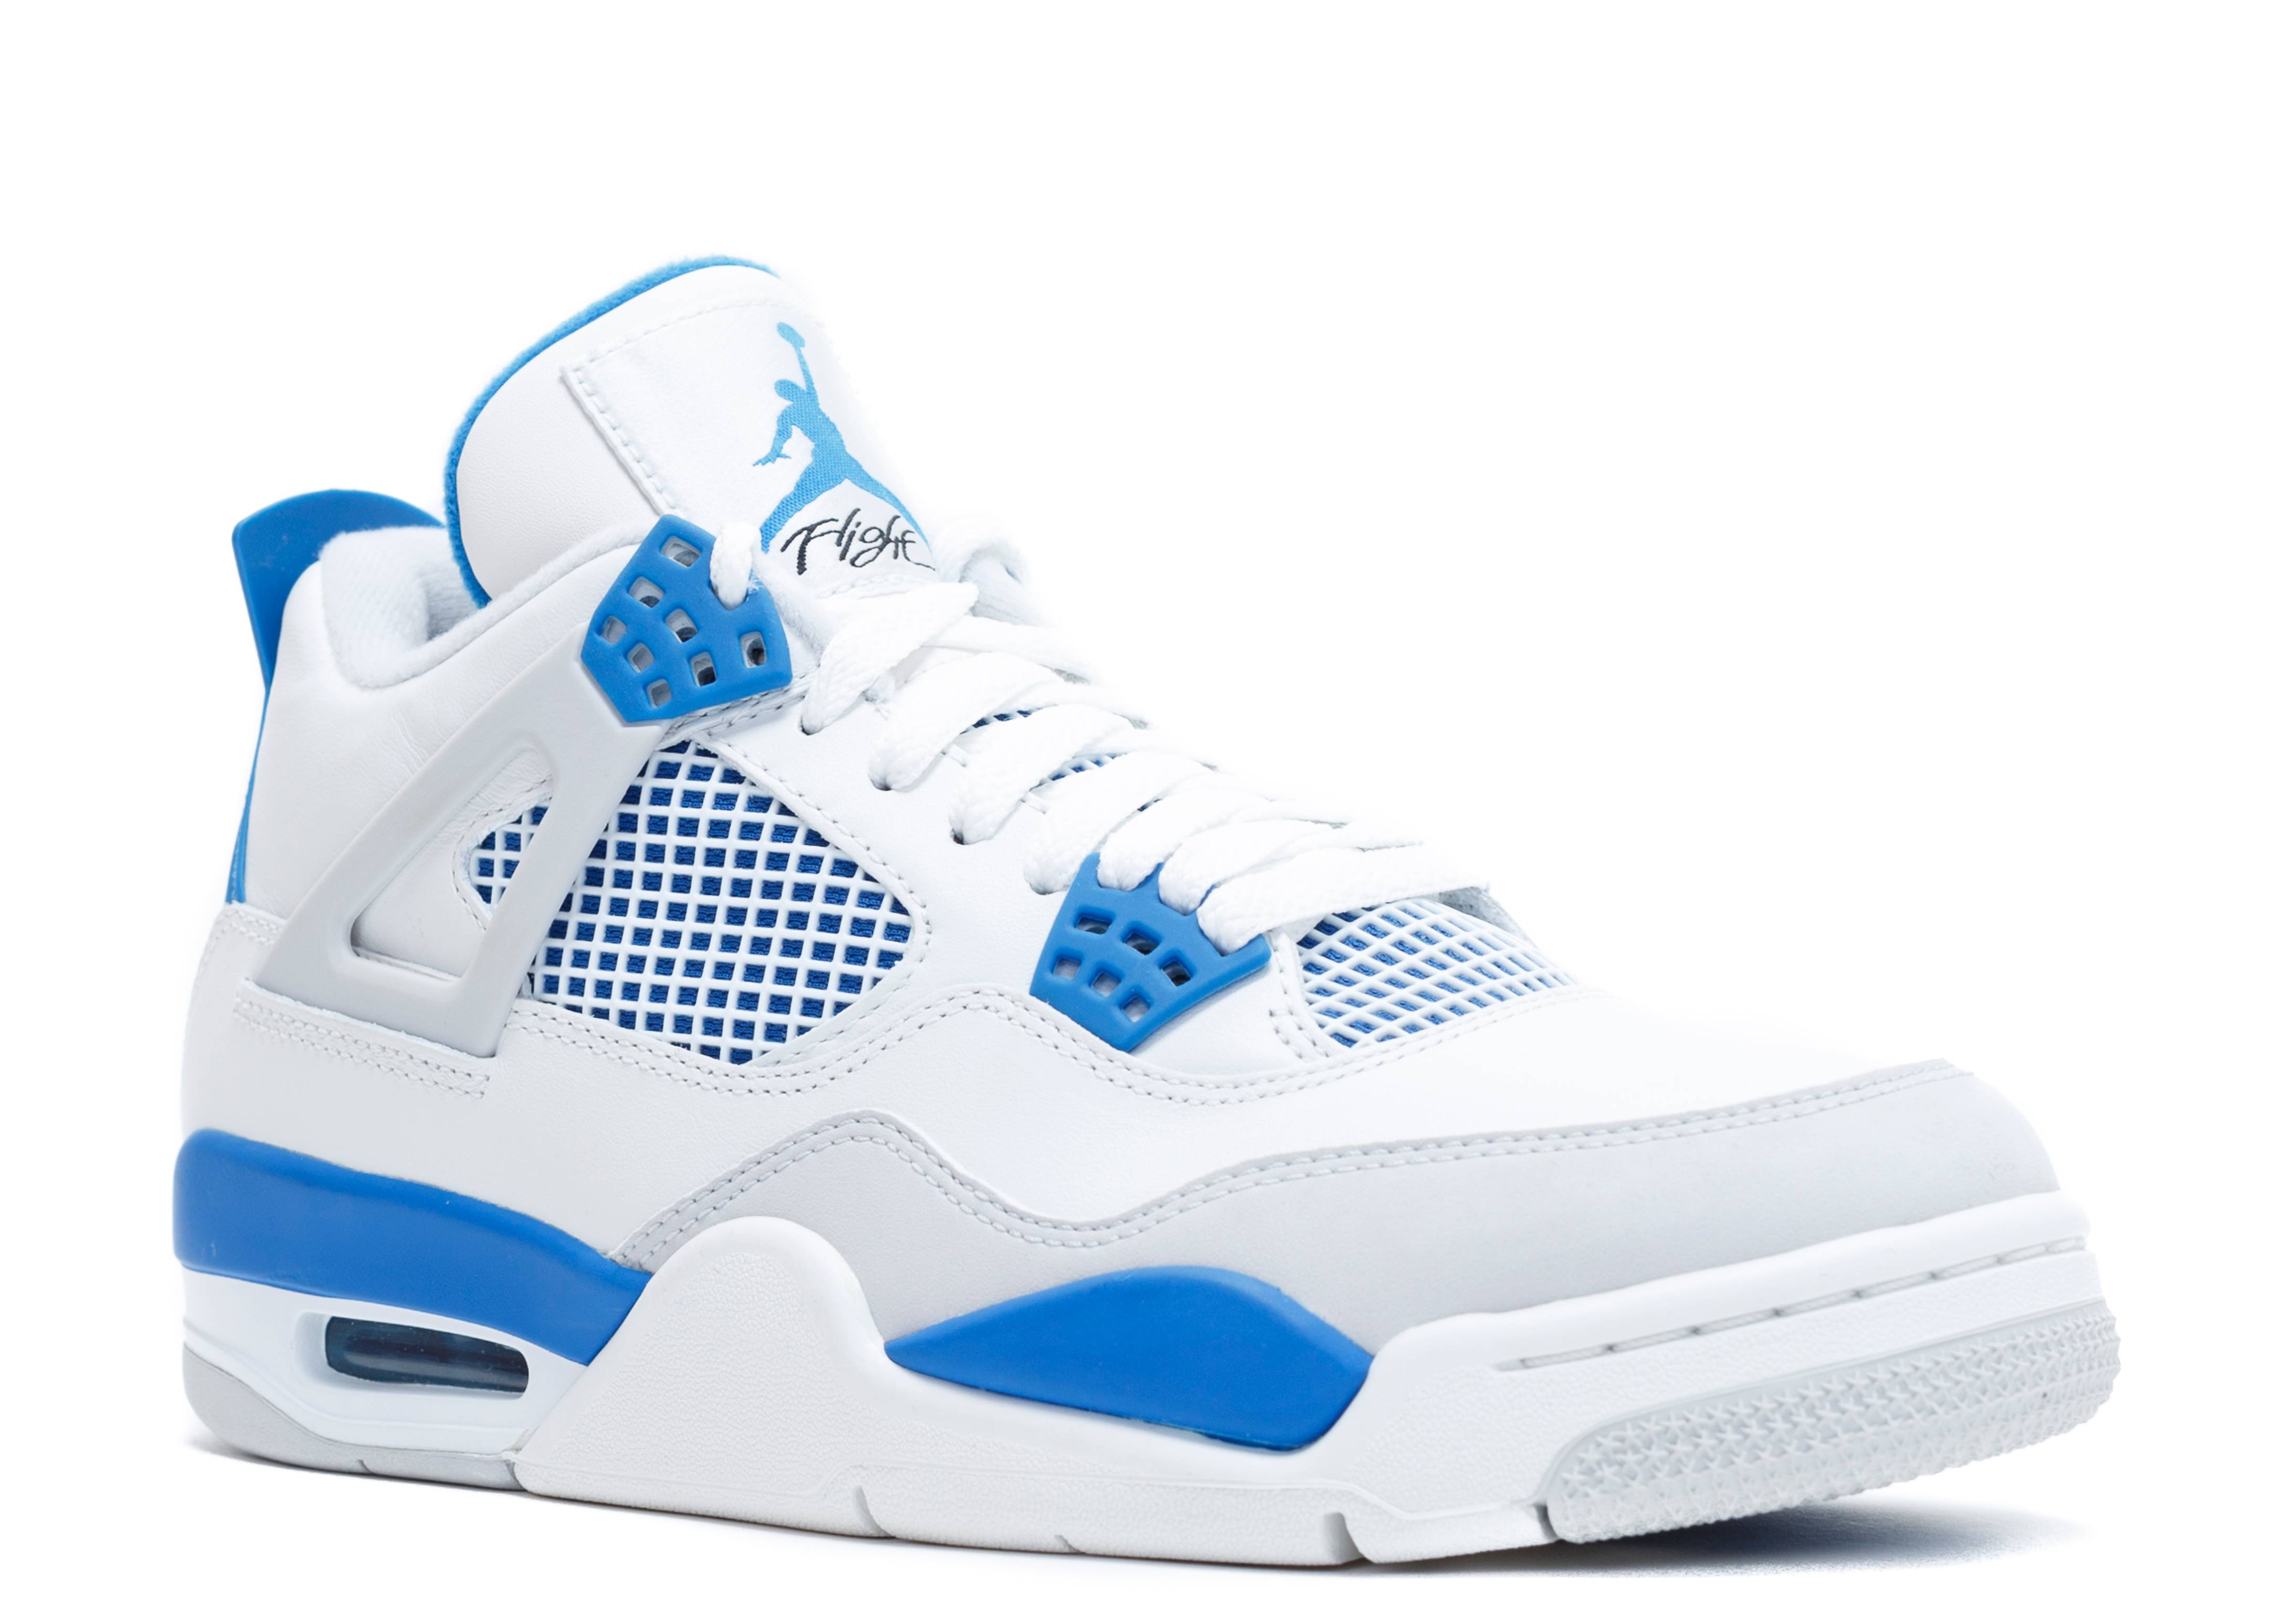 official photos 666e6 b607c Online Cheap 2015 Nike Jordan 4 Cheap sale Military Blues ...